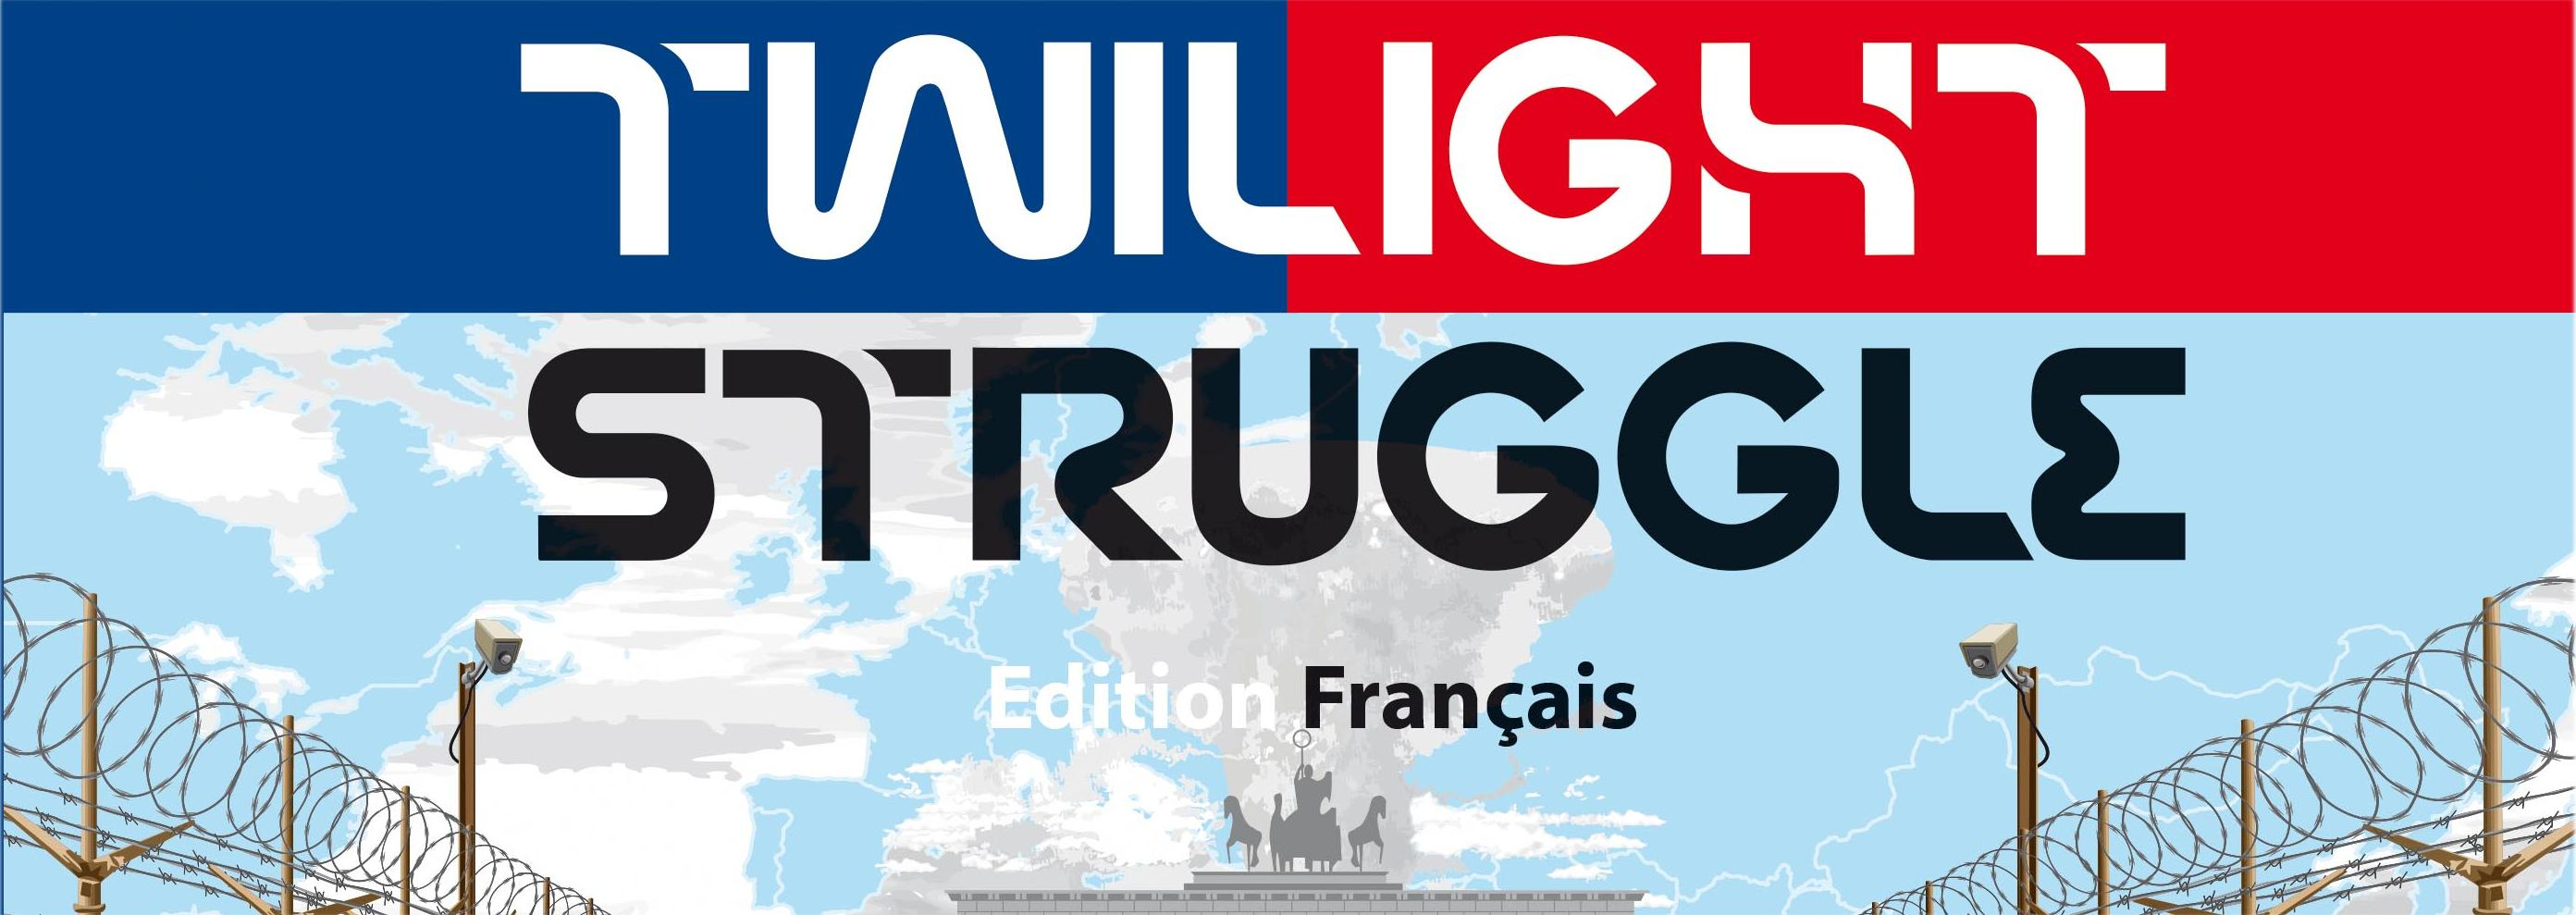 Banner Twilight Struggle F